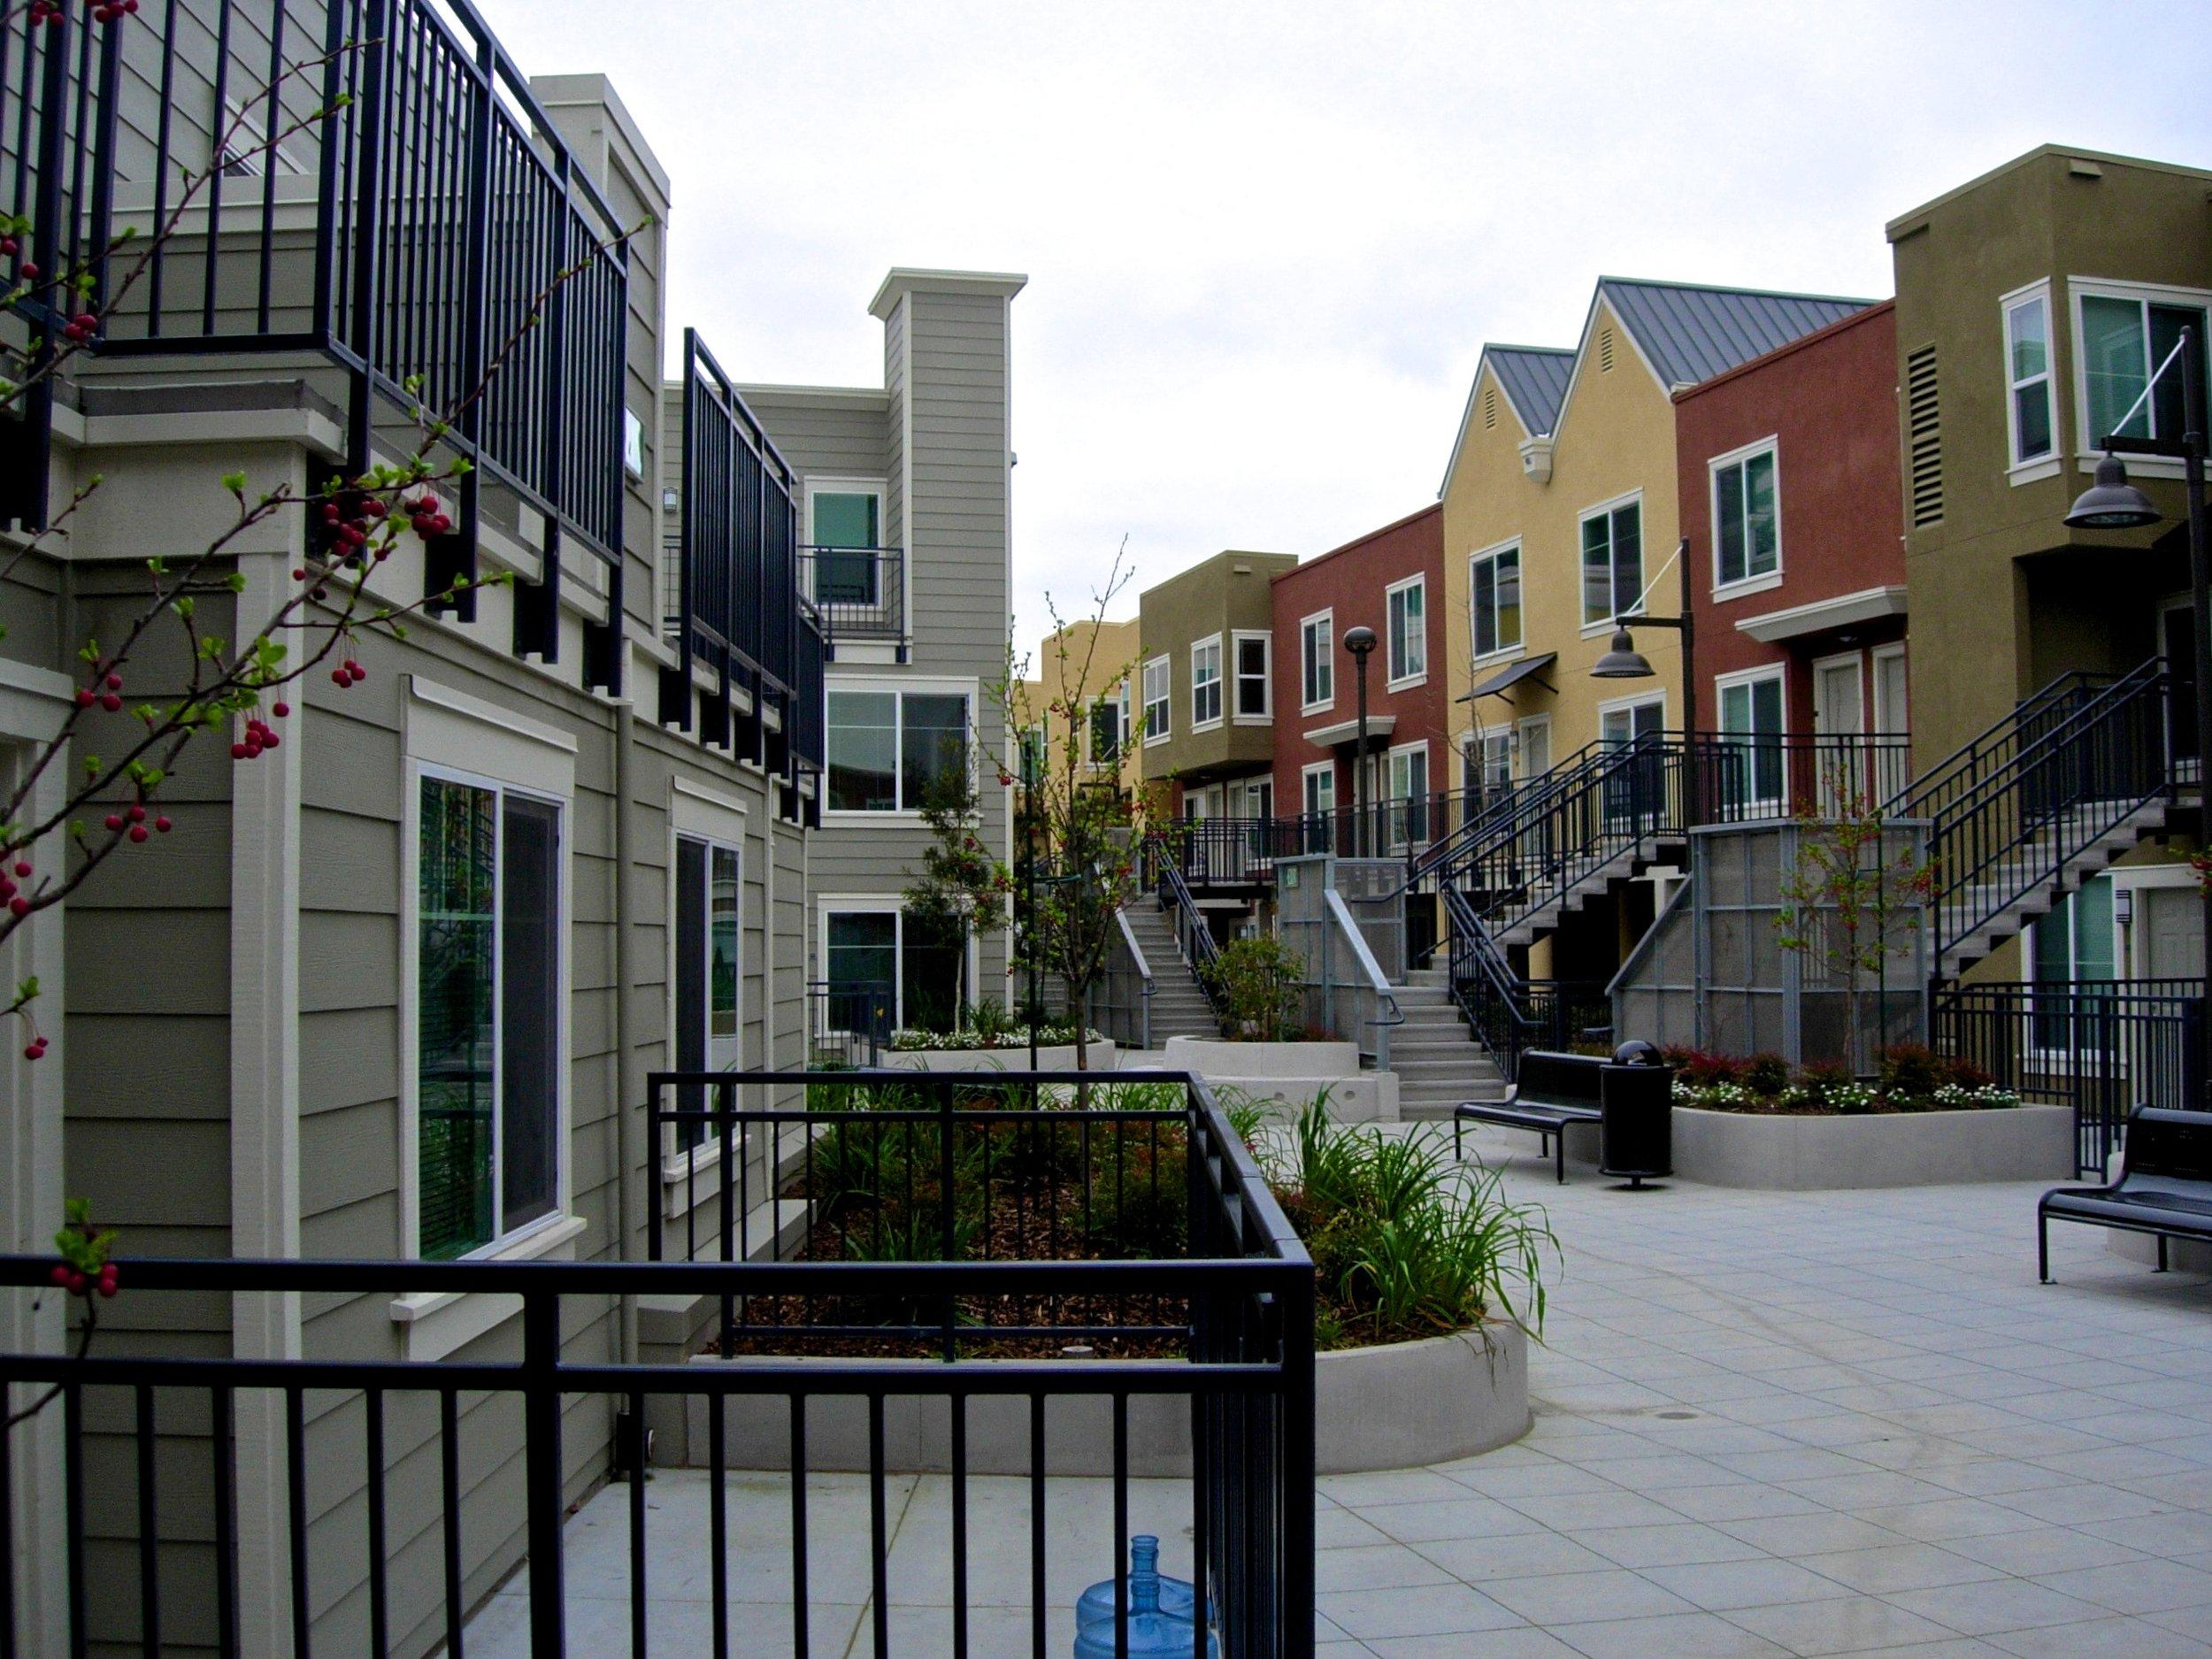 North Beach Place Housing - San Francisco, California, USA